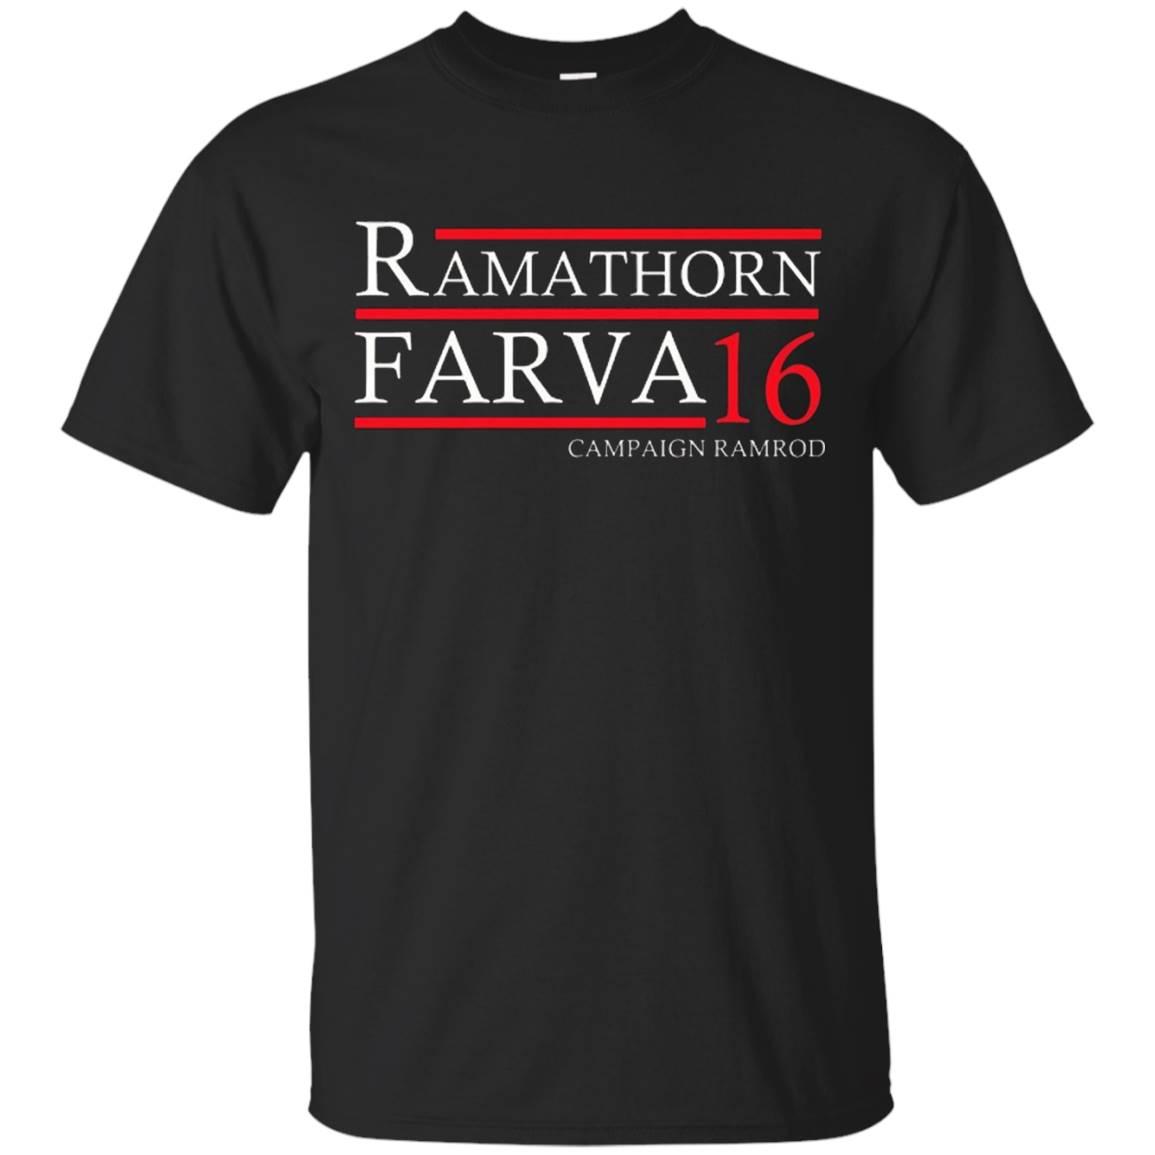 Ramathorn Farva 16 Campaign Ramrod T-shirt